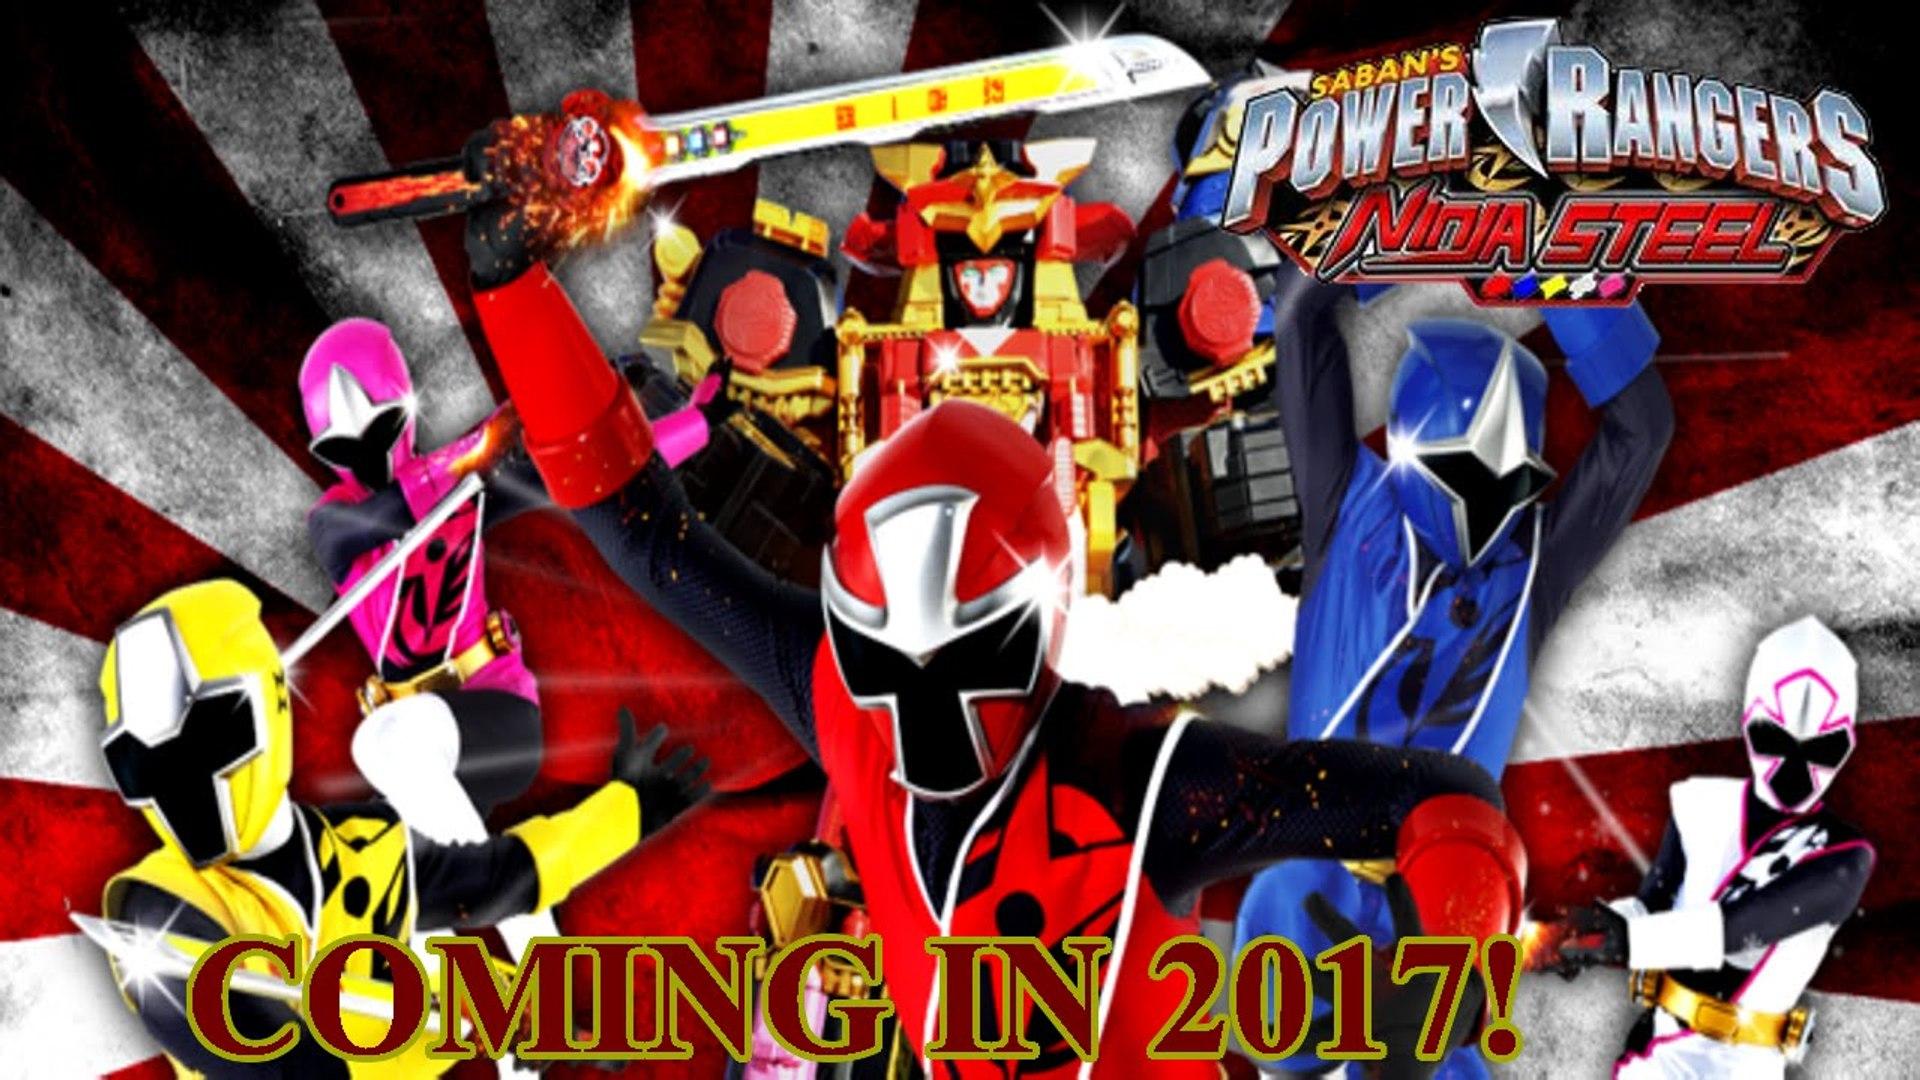 Power Rangers Ninja Steel (2017) Episode 19 English Sub